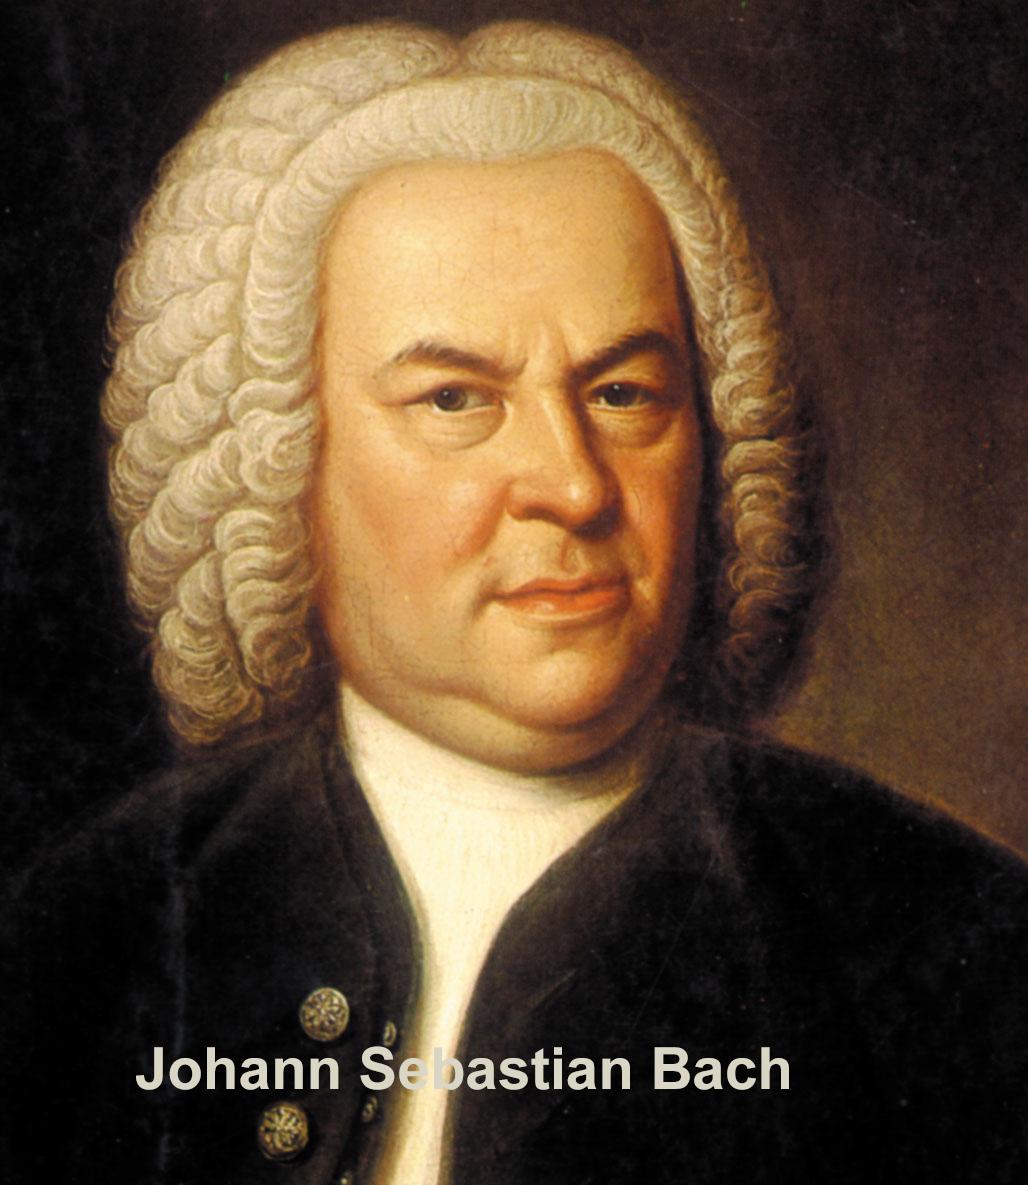 Johann Sebastiaan Bach